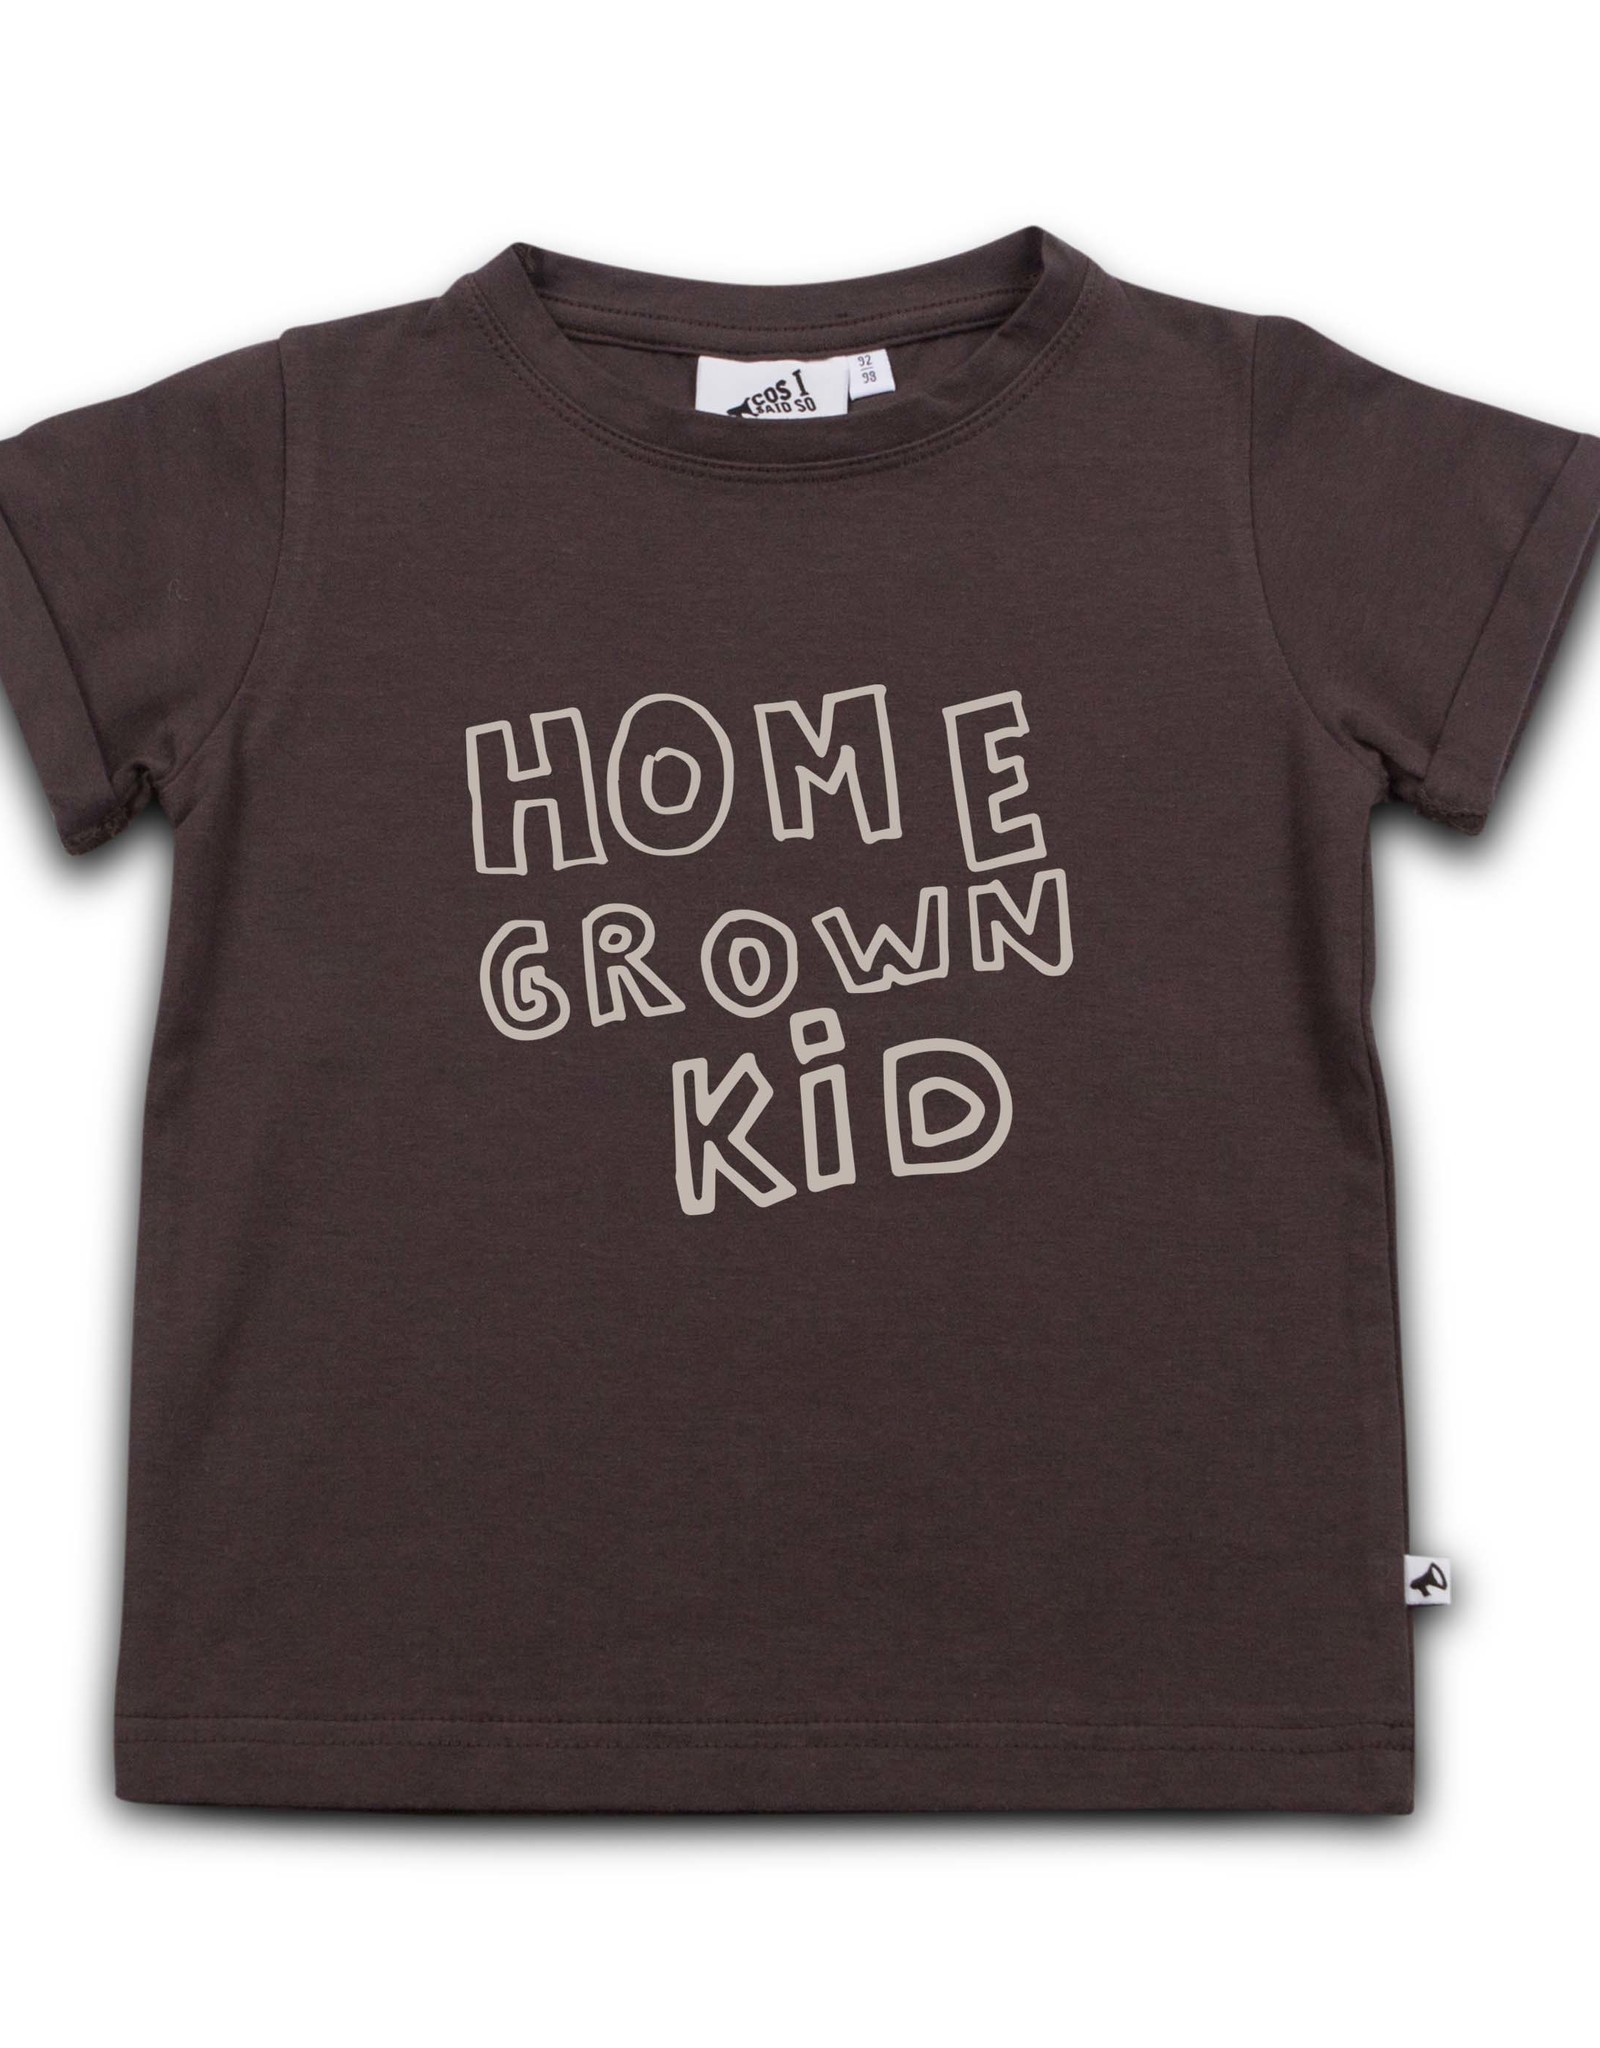 Cos i said so Cos i said so - Home grown kid shirt - shale